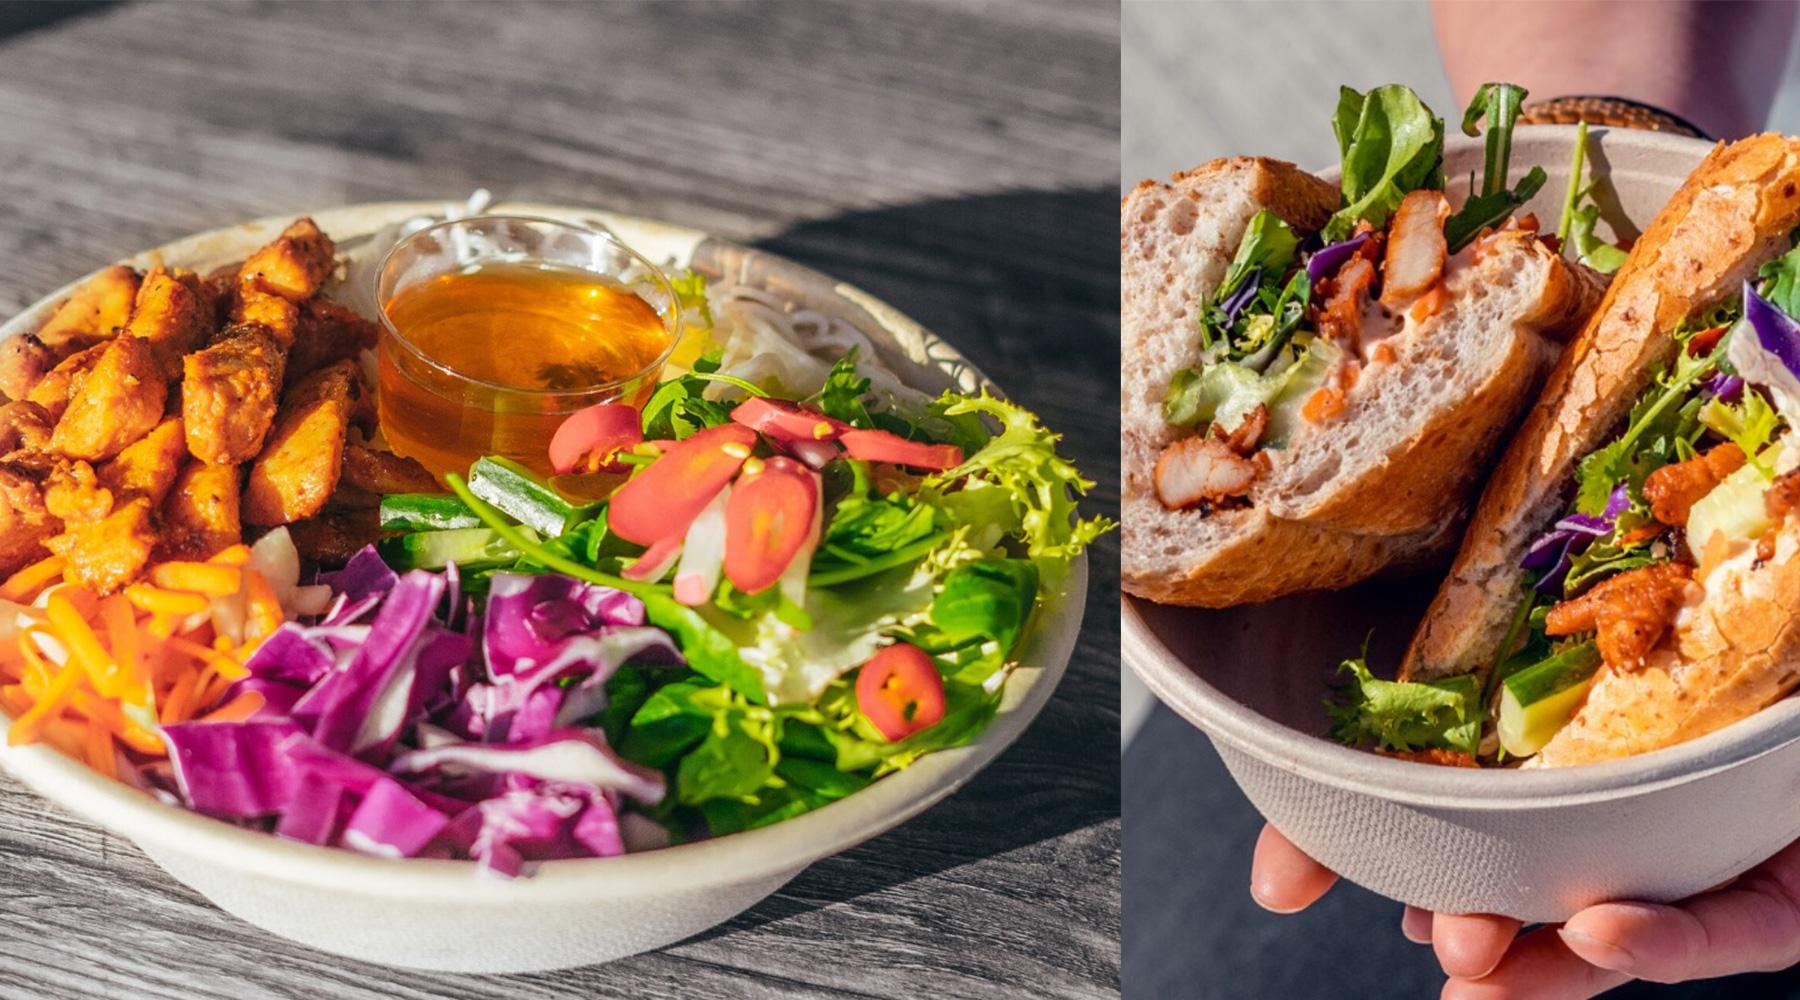 Ny asiatisk madbod i Ryesgade:Alle retter på menukortet koster 20 kroner stykket